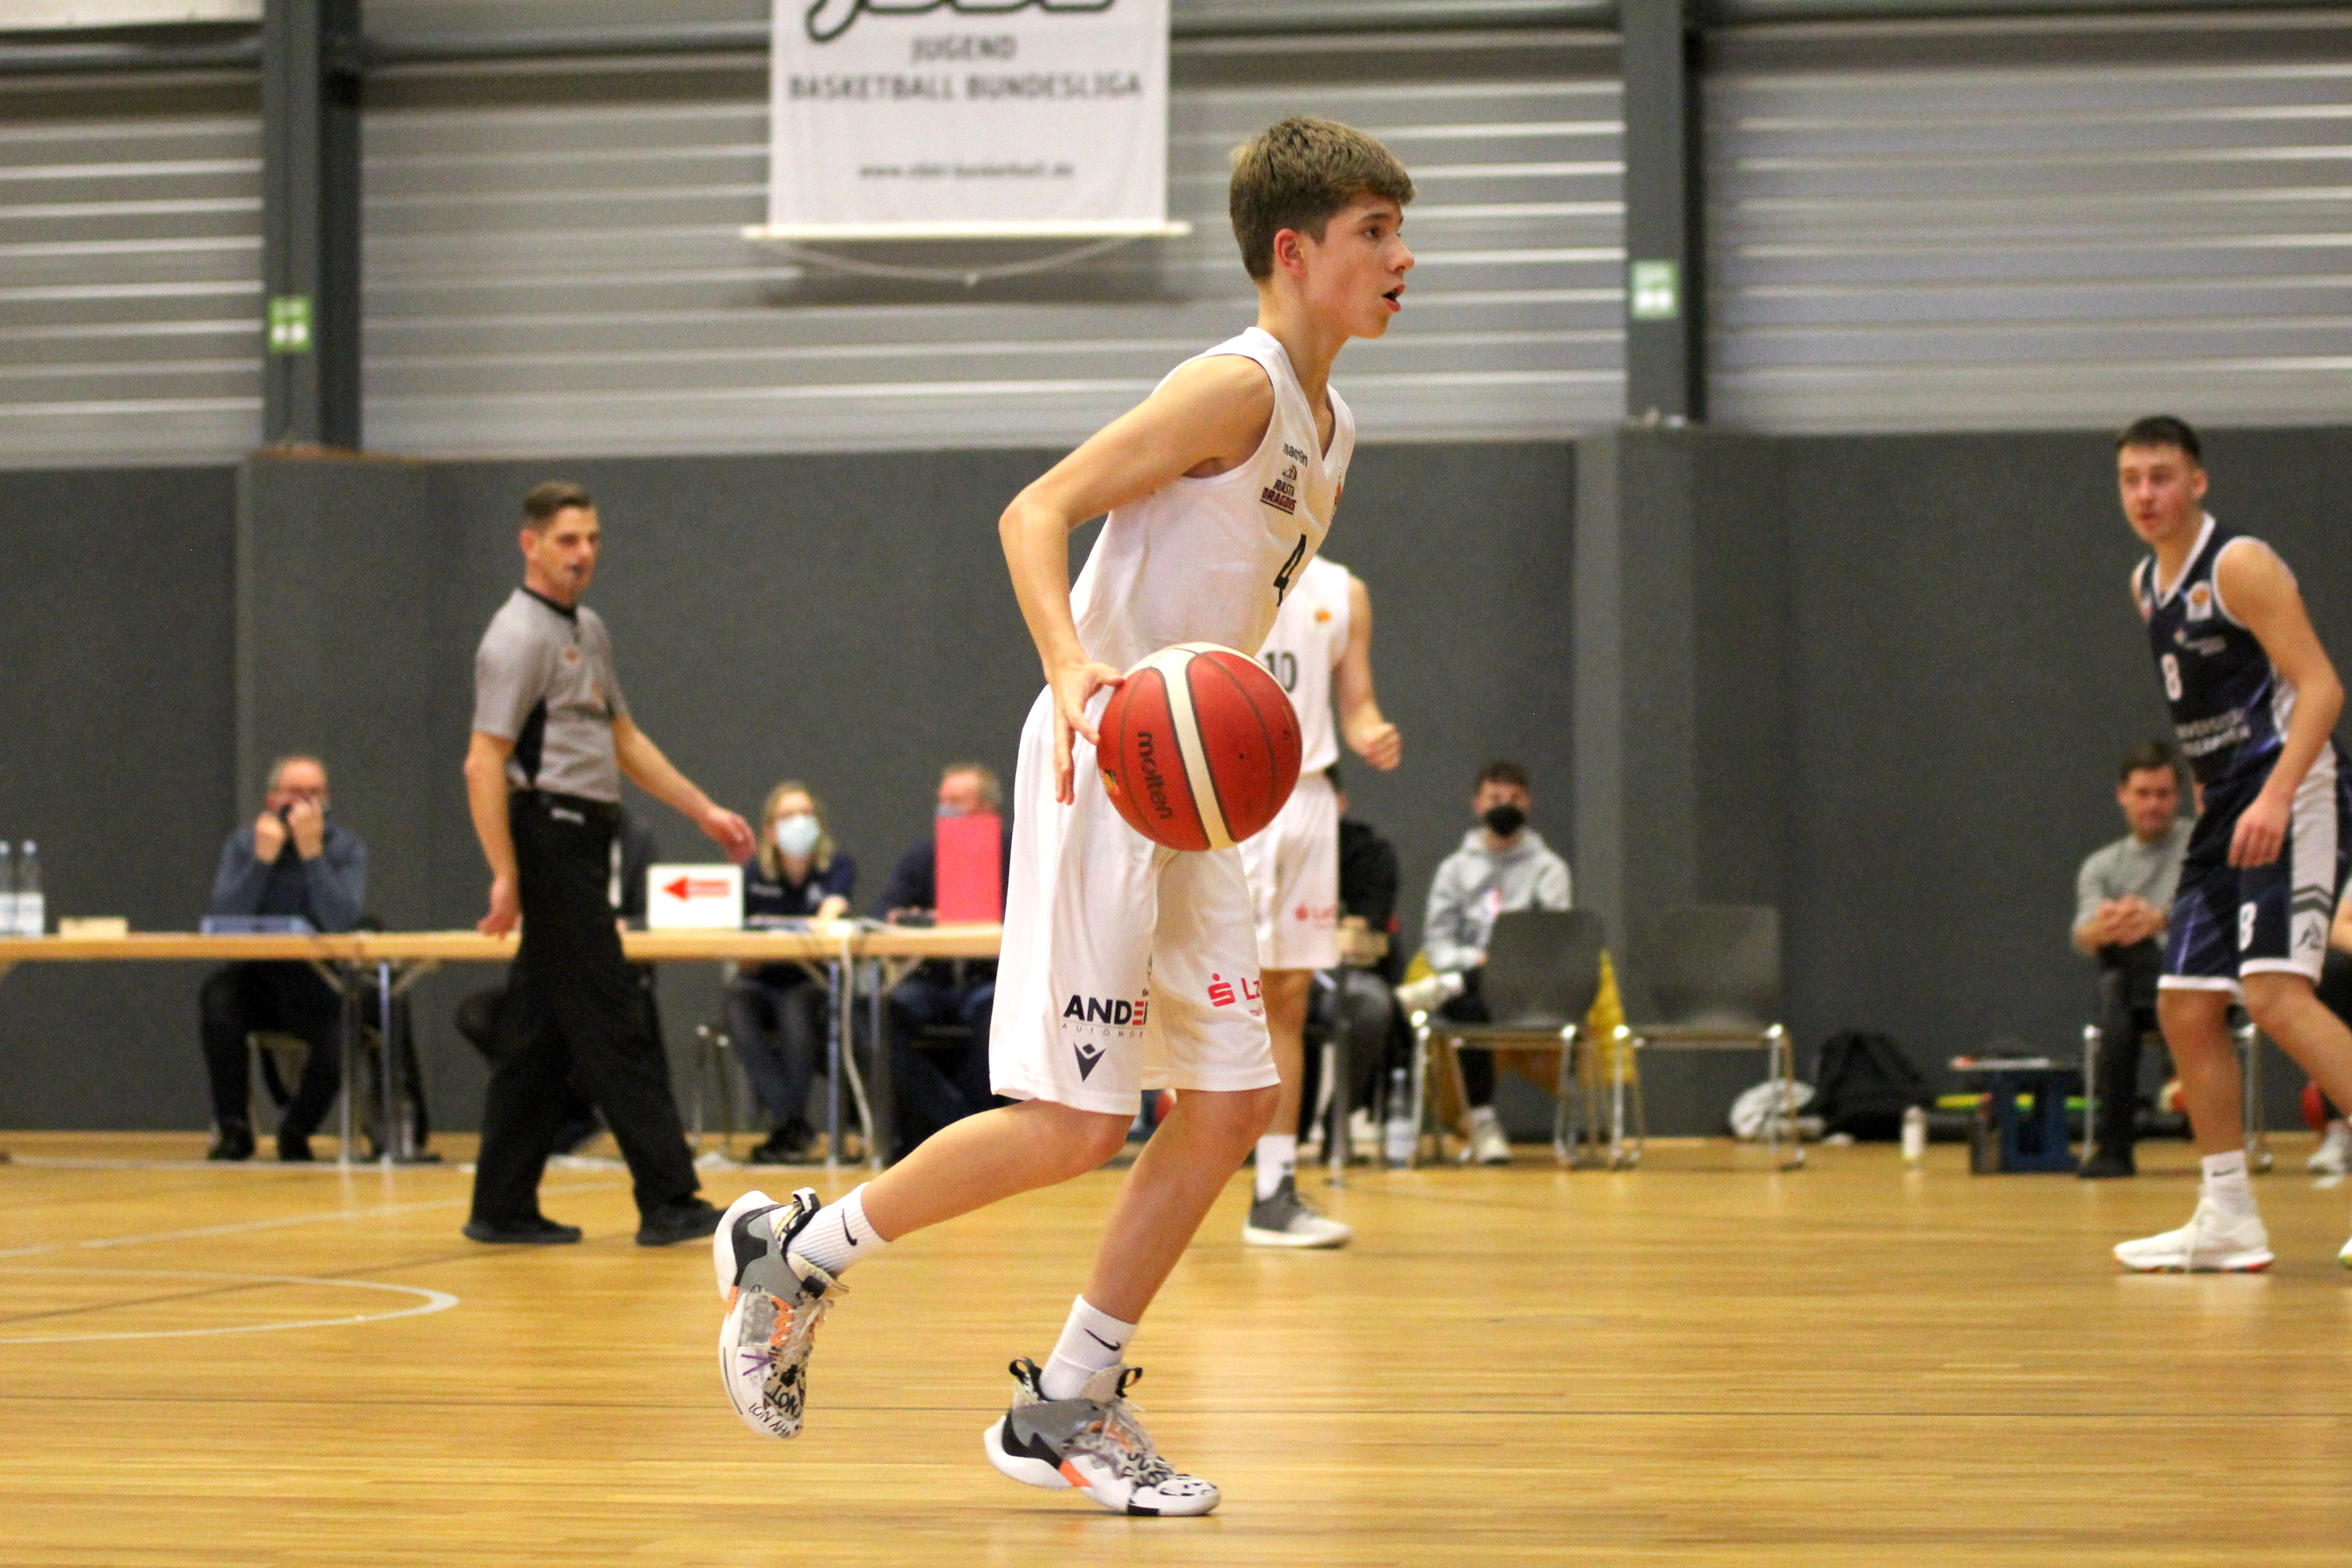 JBBL_20-21_YOUNG-RASTA-DRAGONS_Paderborn_Spieltag2_Jonas-Groß4